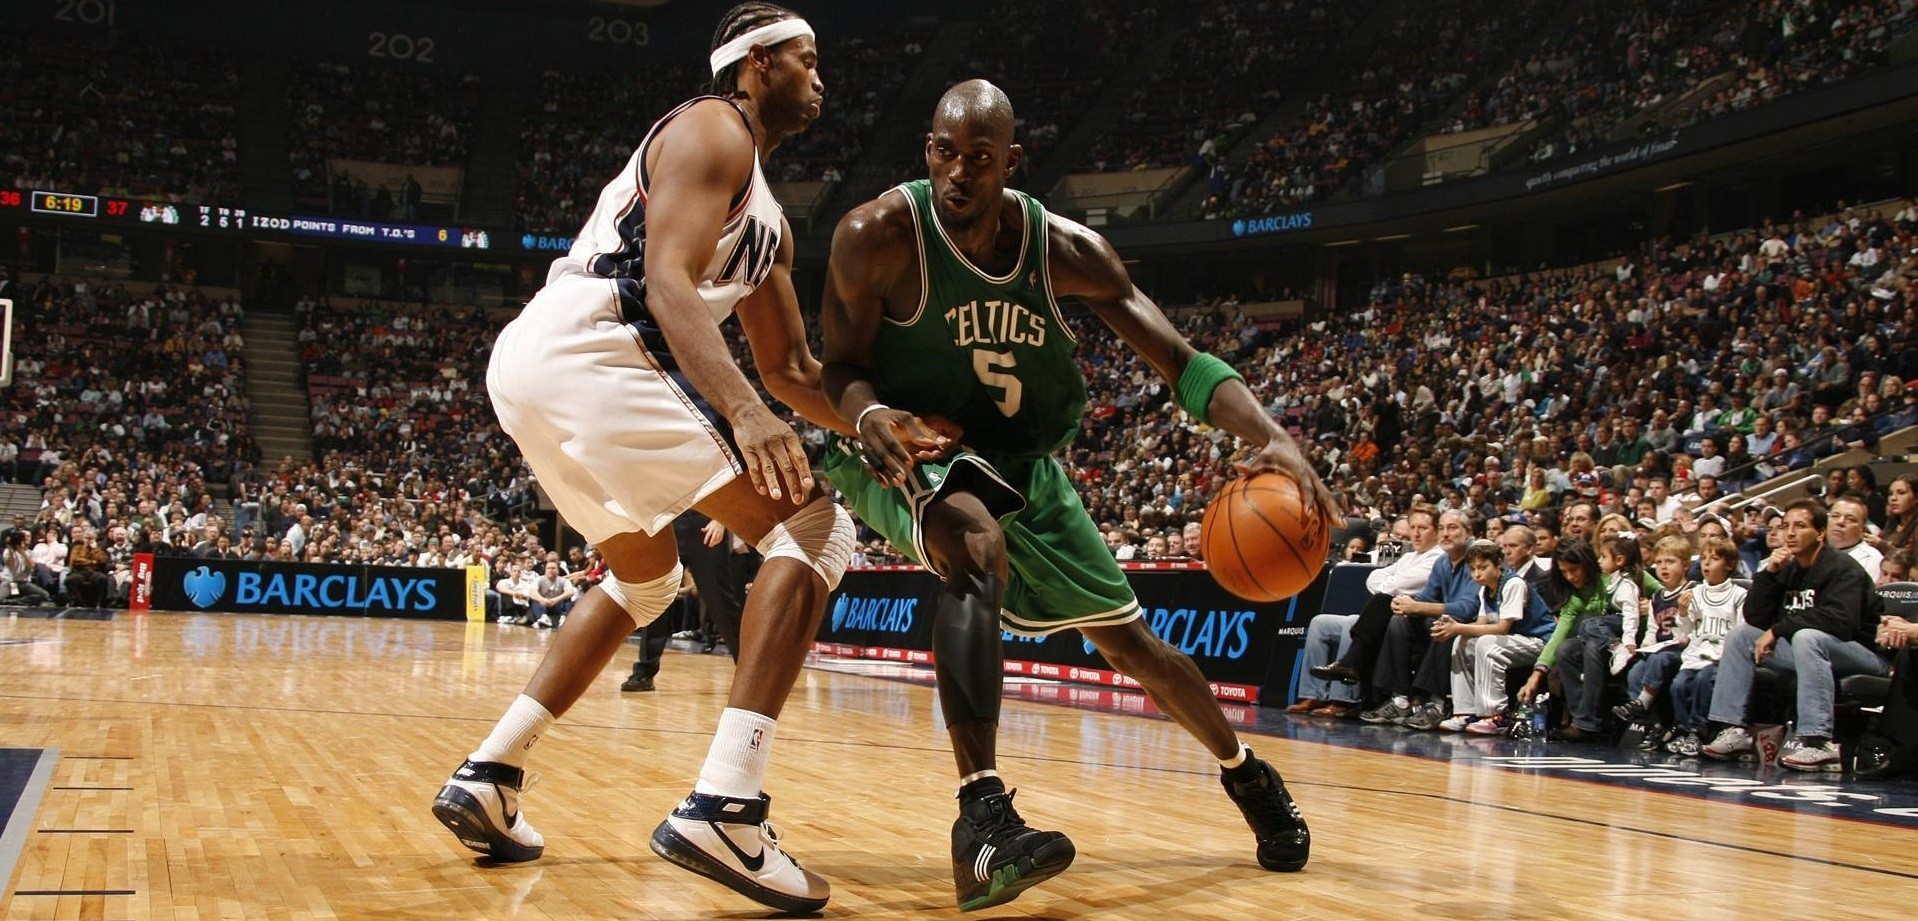 баскетбол стратегия ставок догон